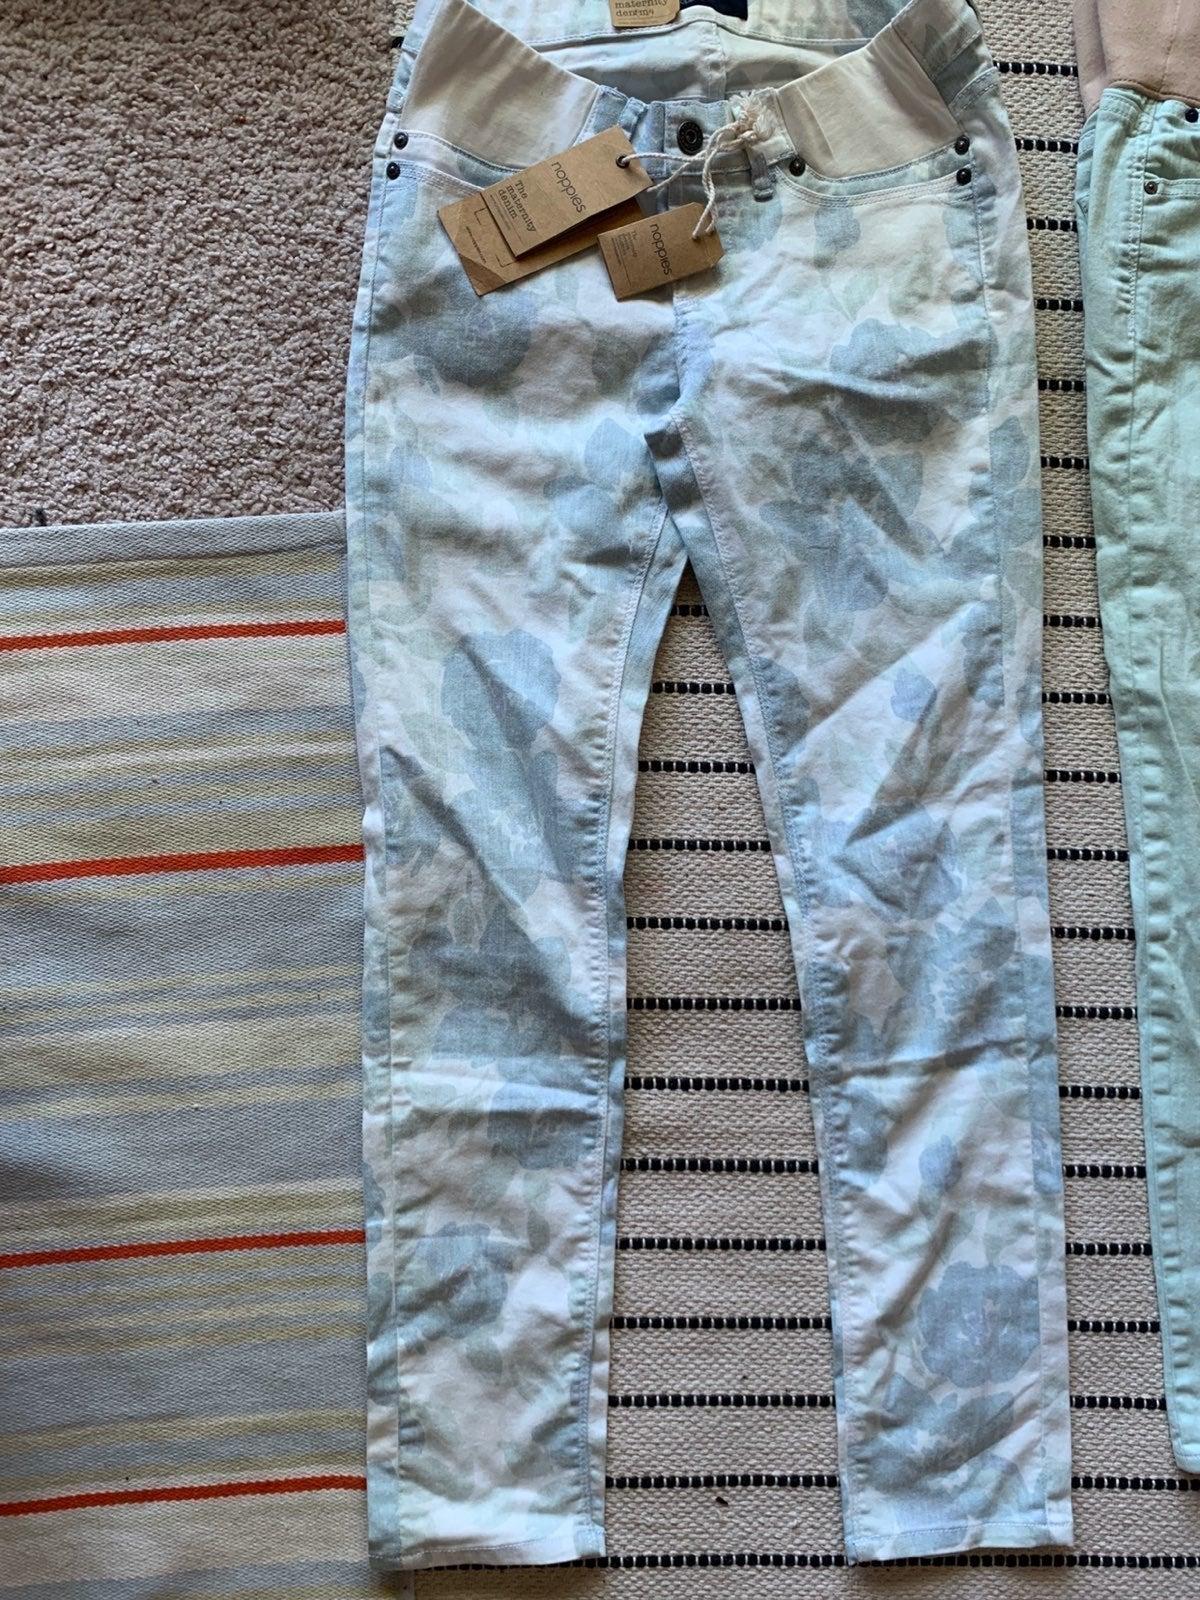 Maternity bundle 4 pastel jeans size 27